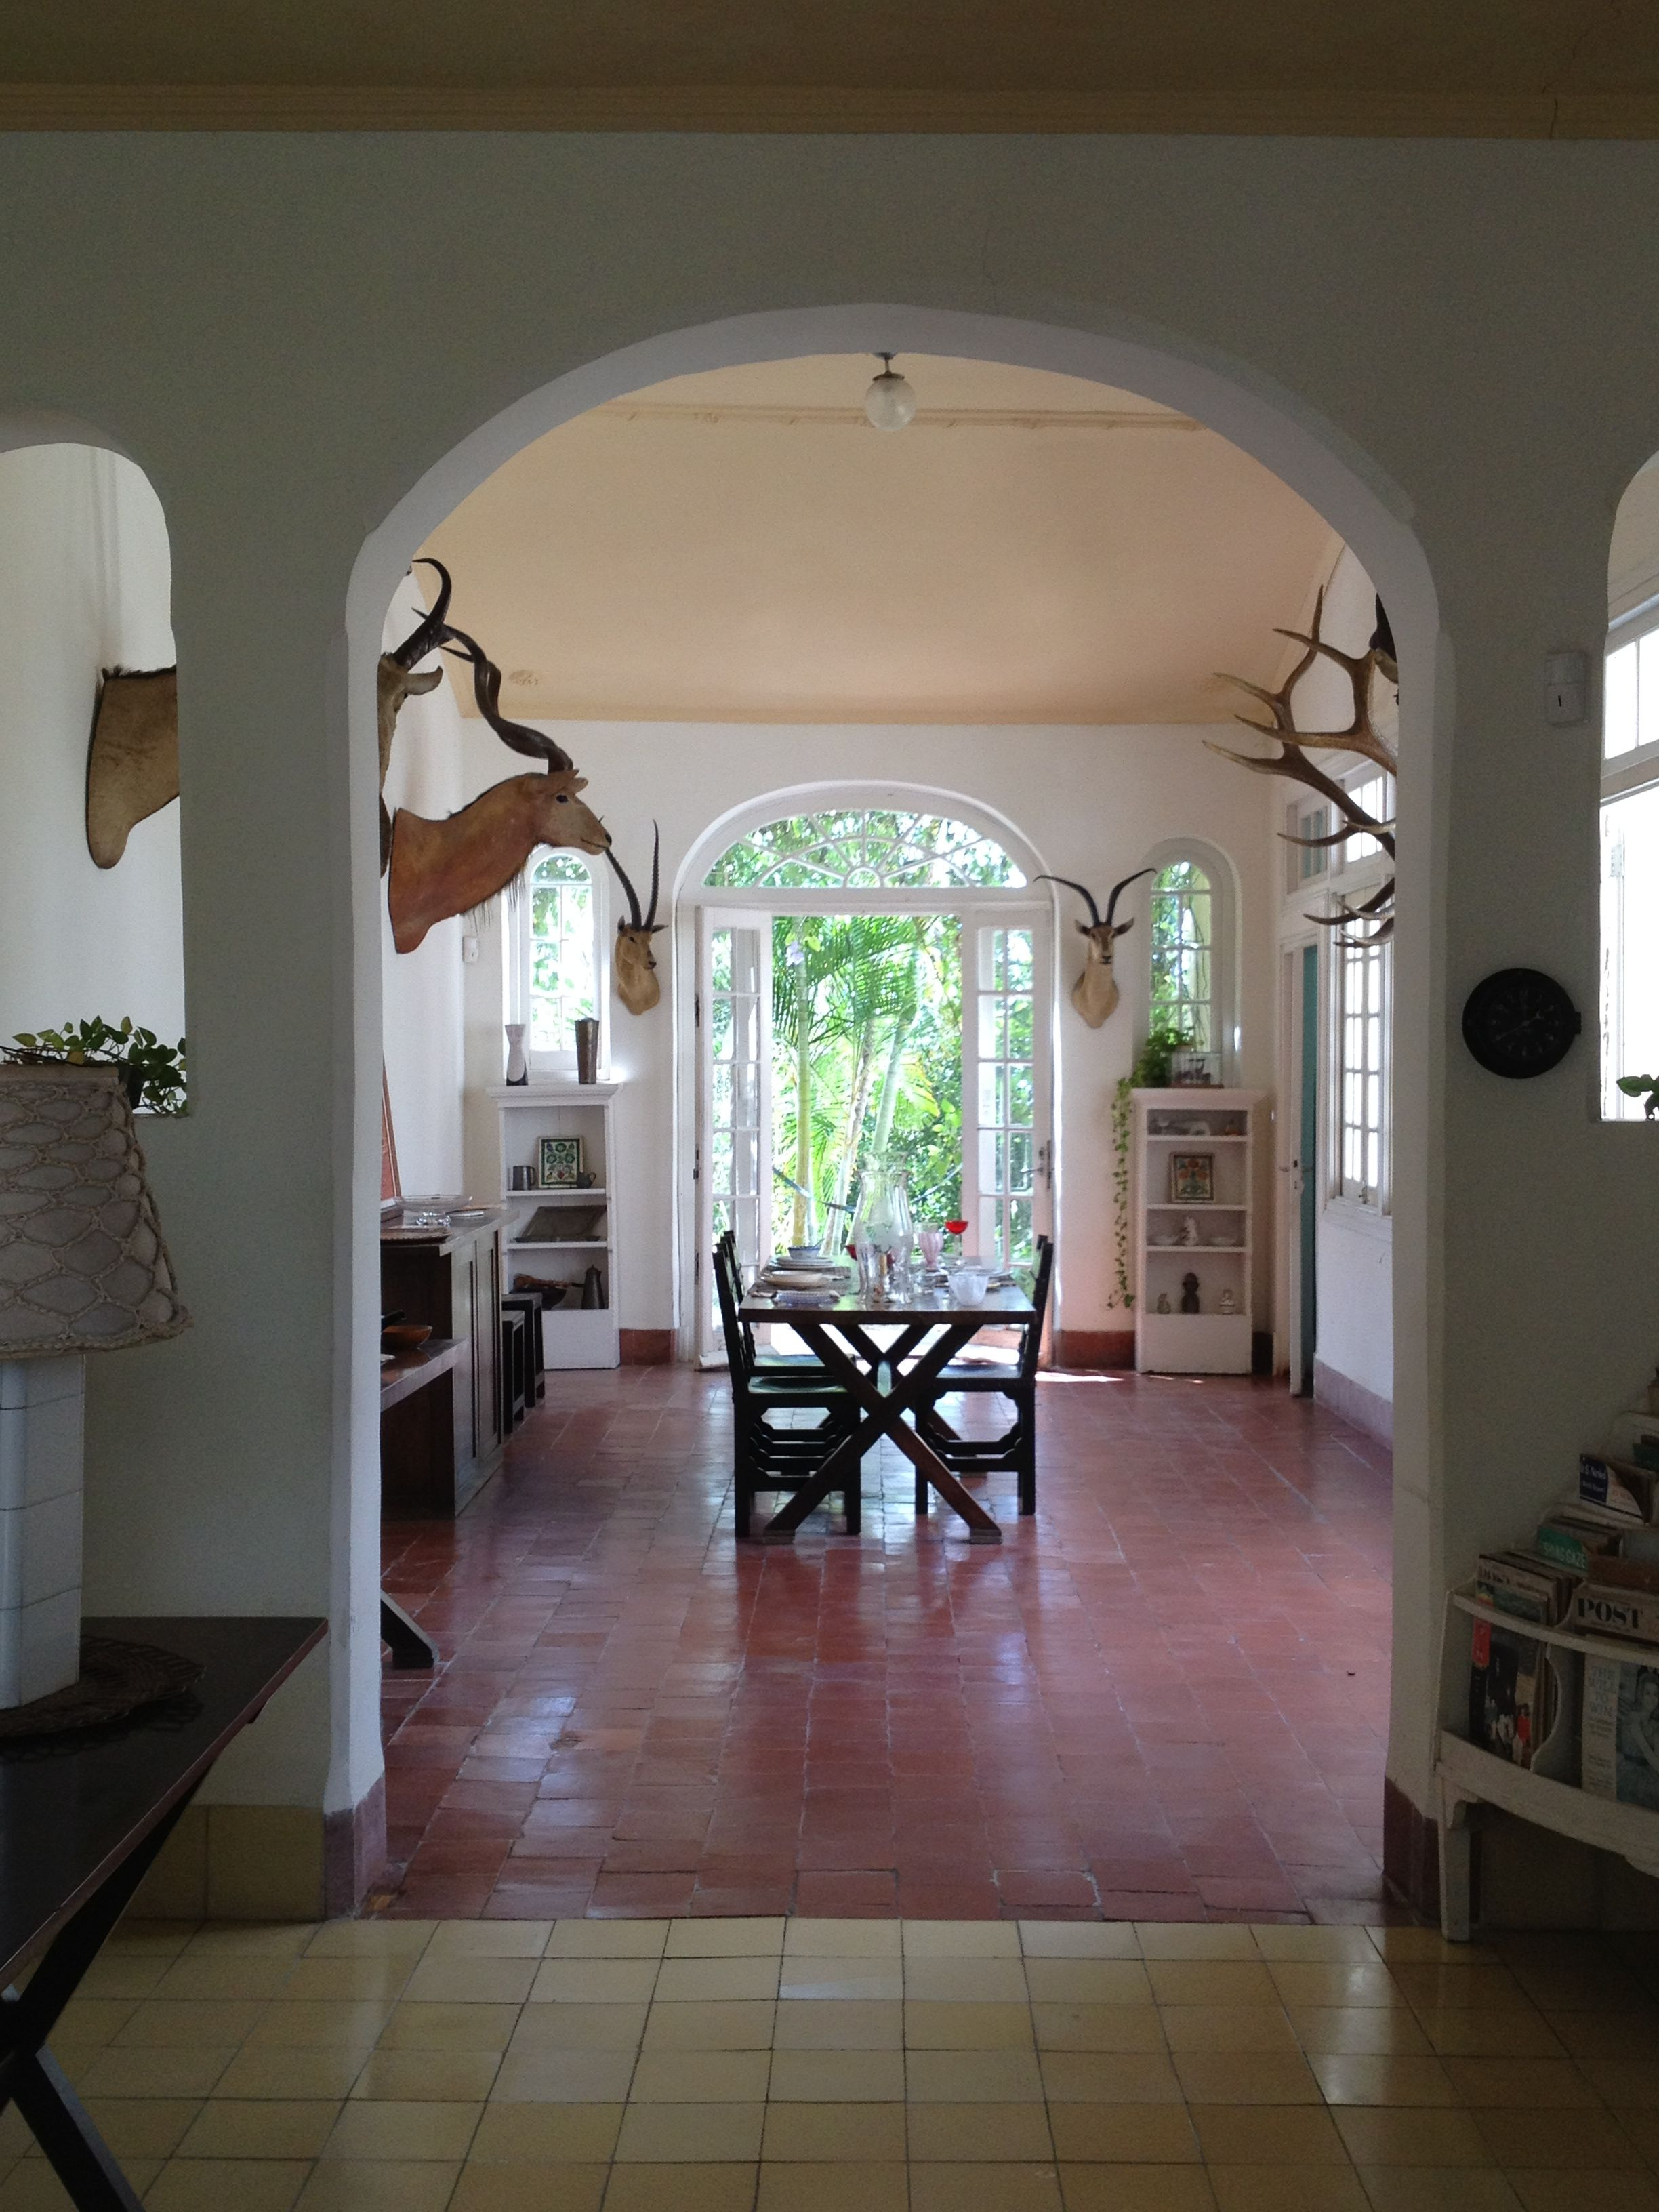 Hemingway's house in CUBA